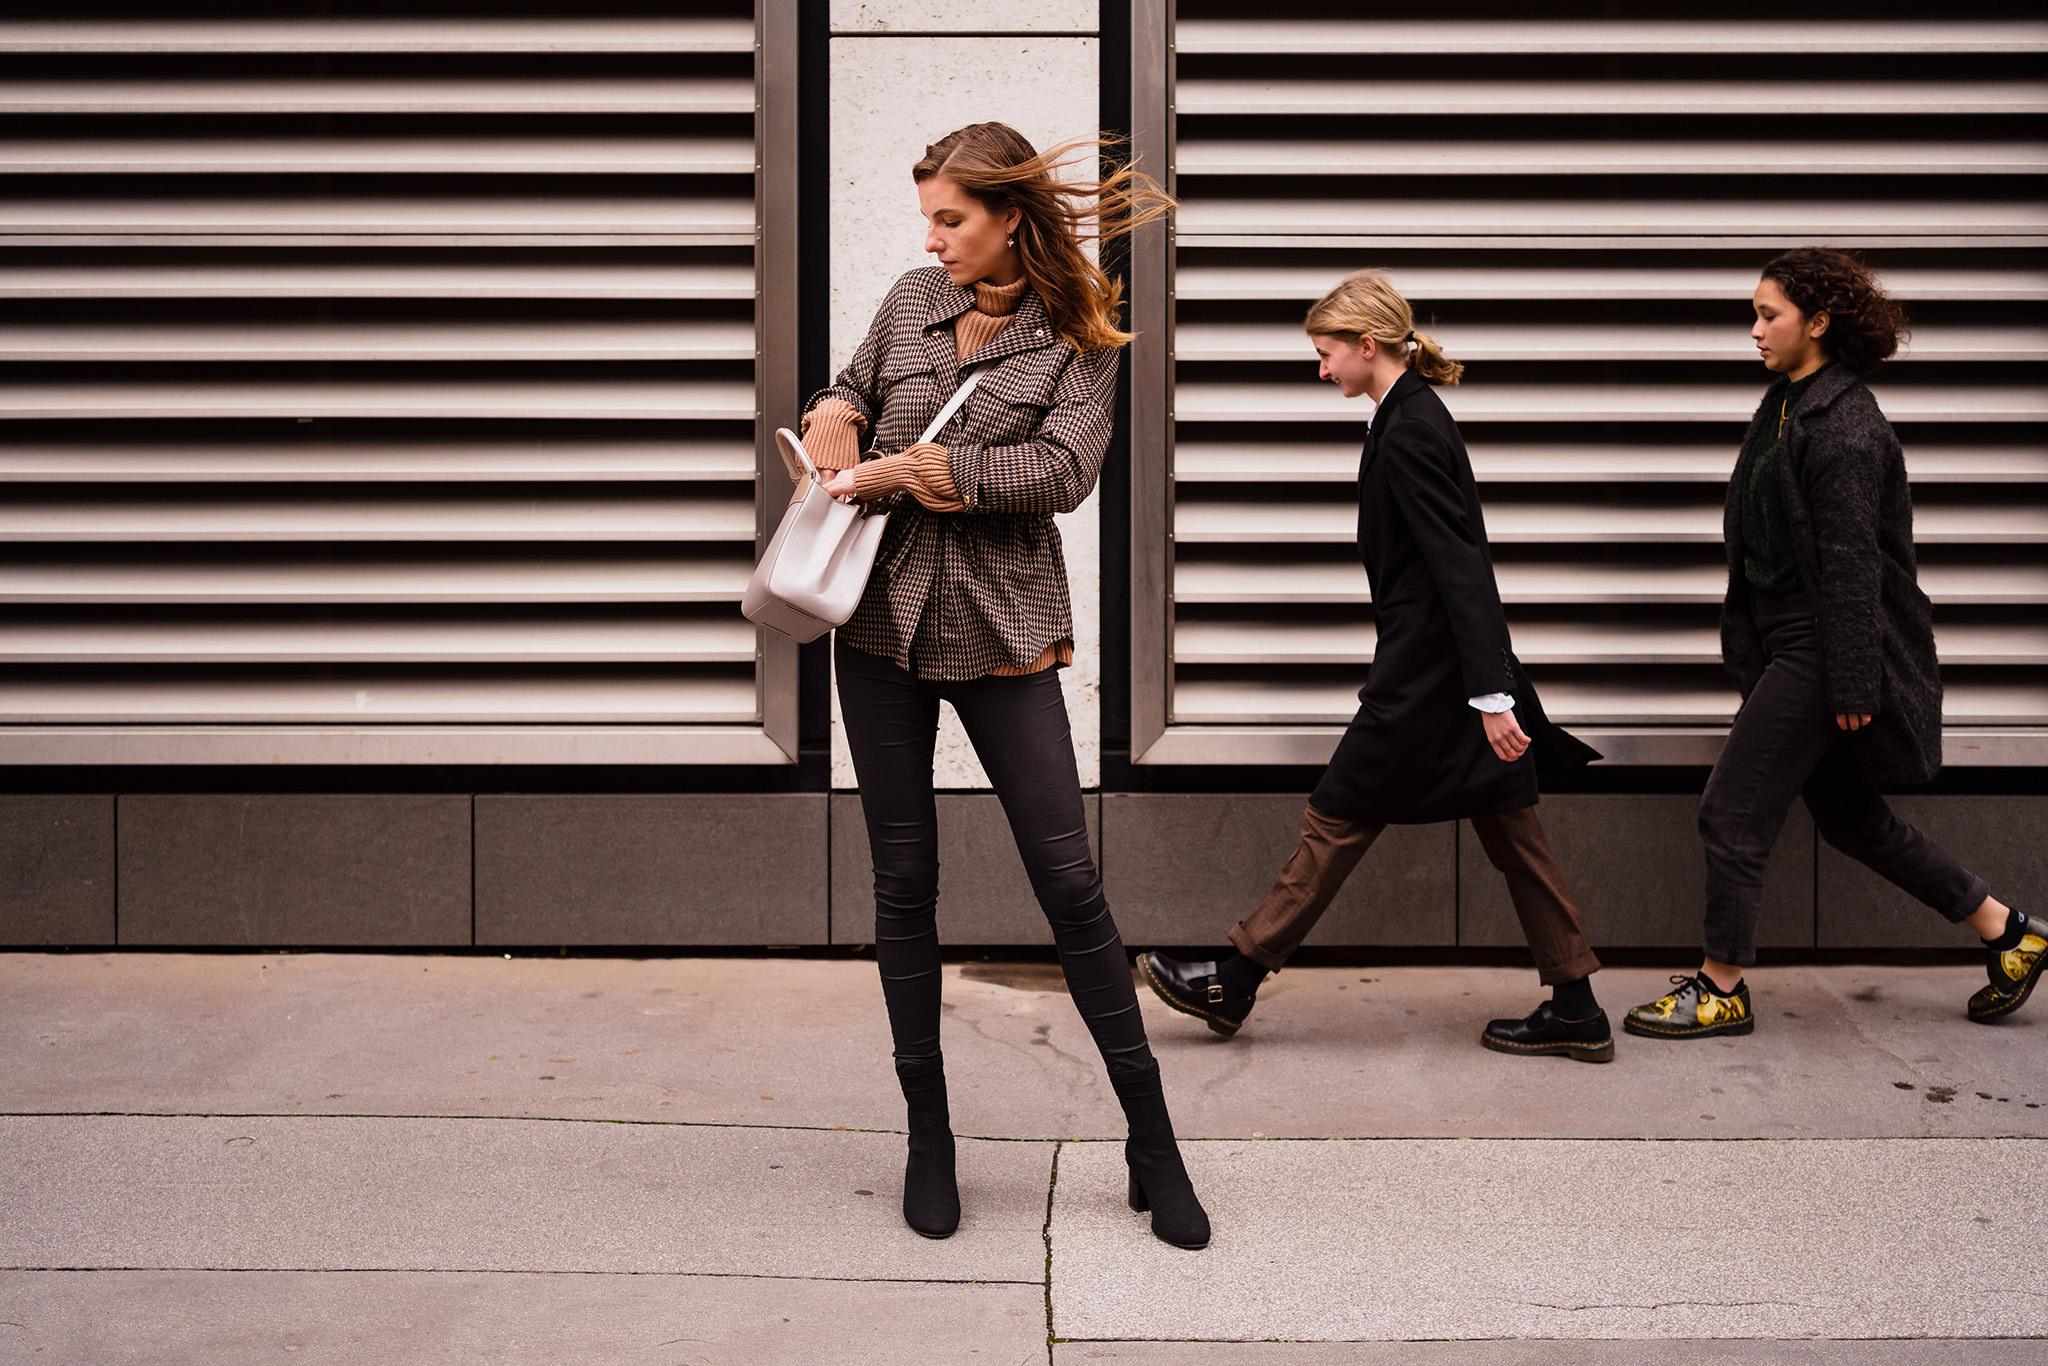 London street portrait photography